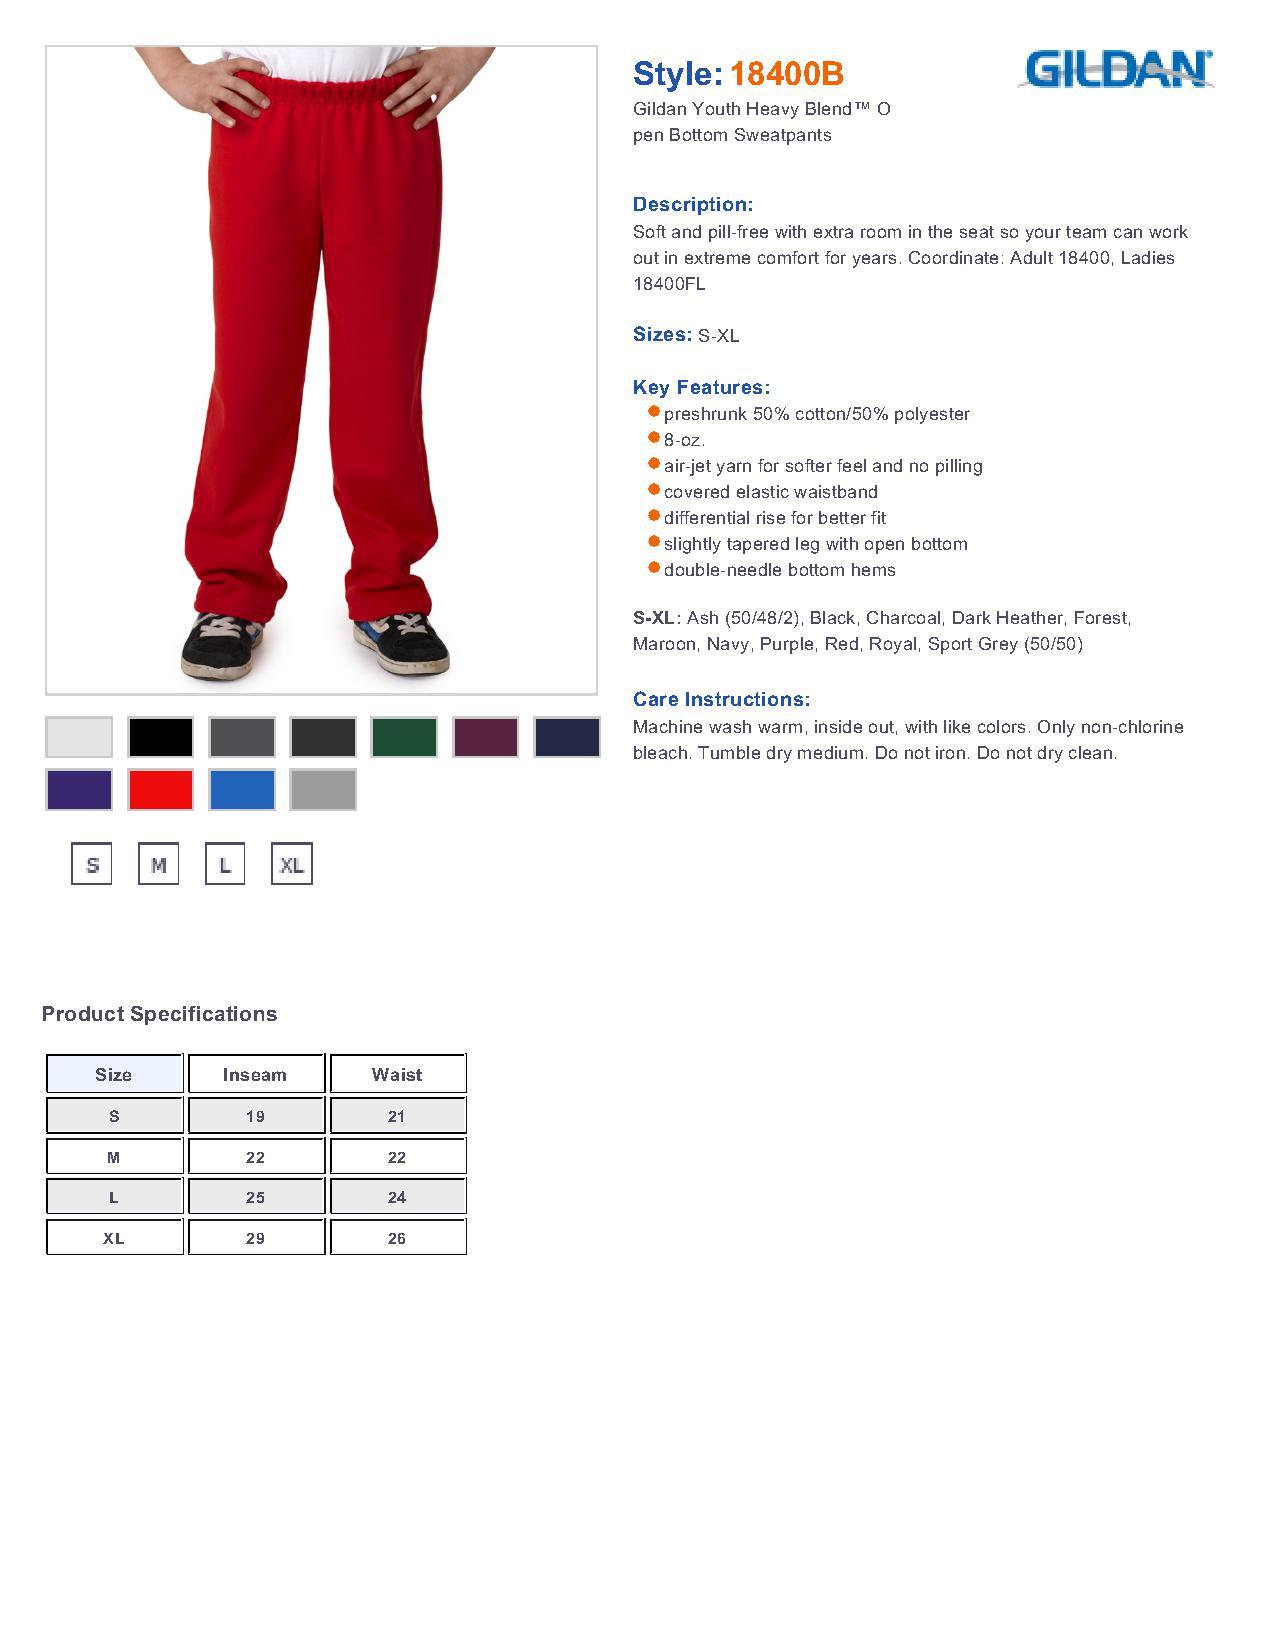 Gildan 18400b youth heavy blend open bottom sweatpants 1035 specs sizing specs nvjuhfo Gallery